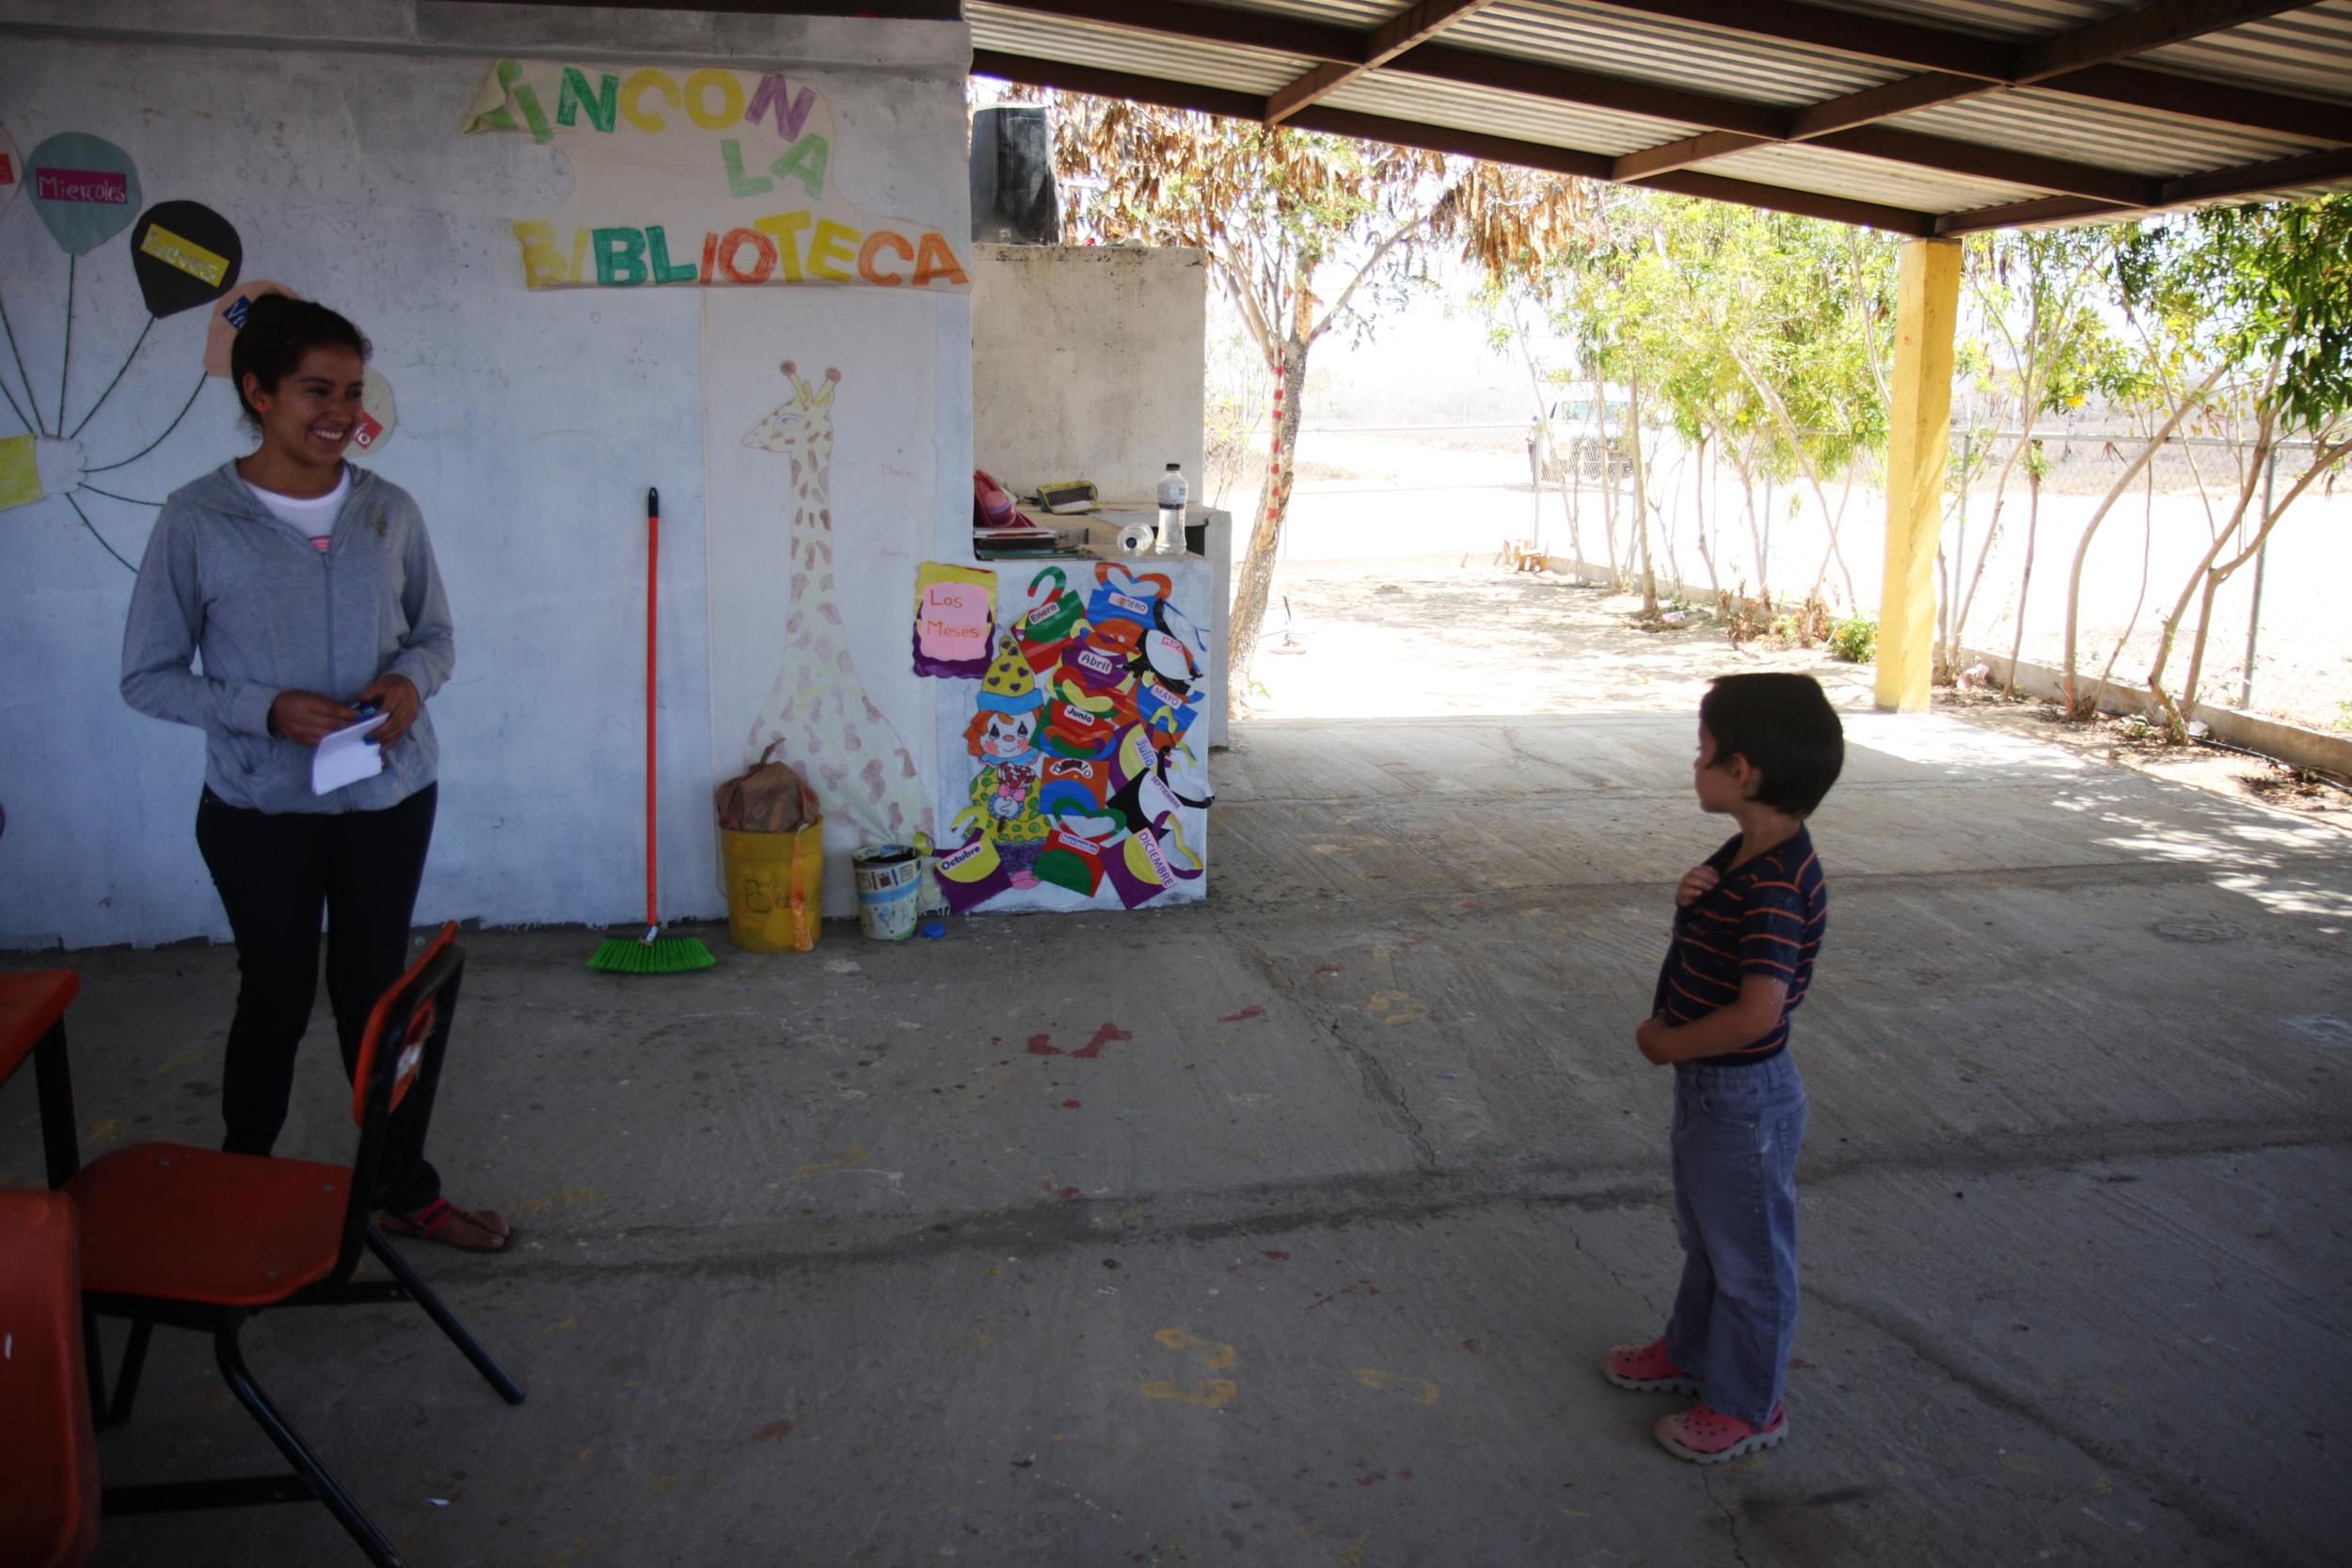 The first moment Emilio met Vanessa, his teacher.